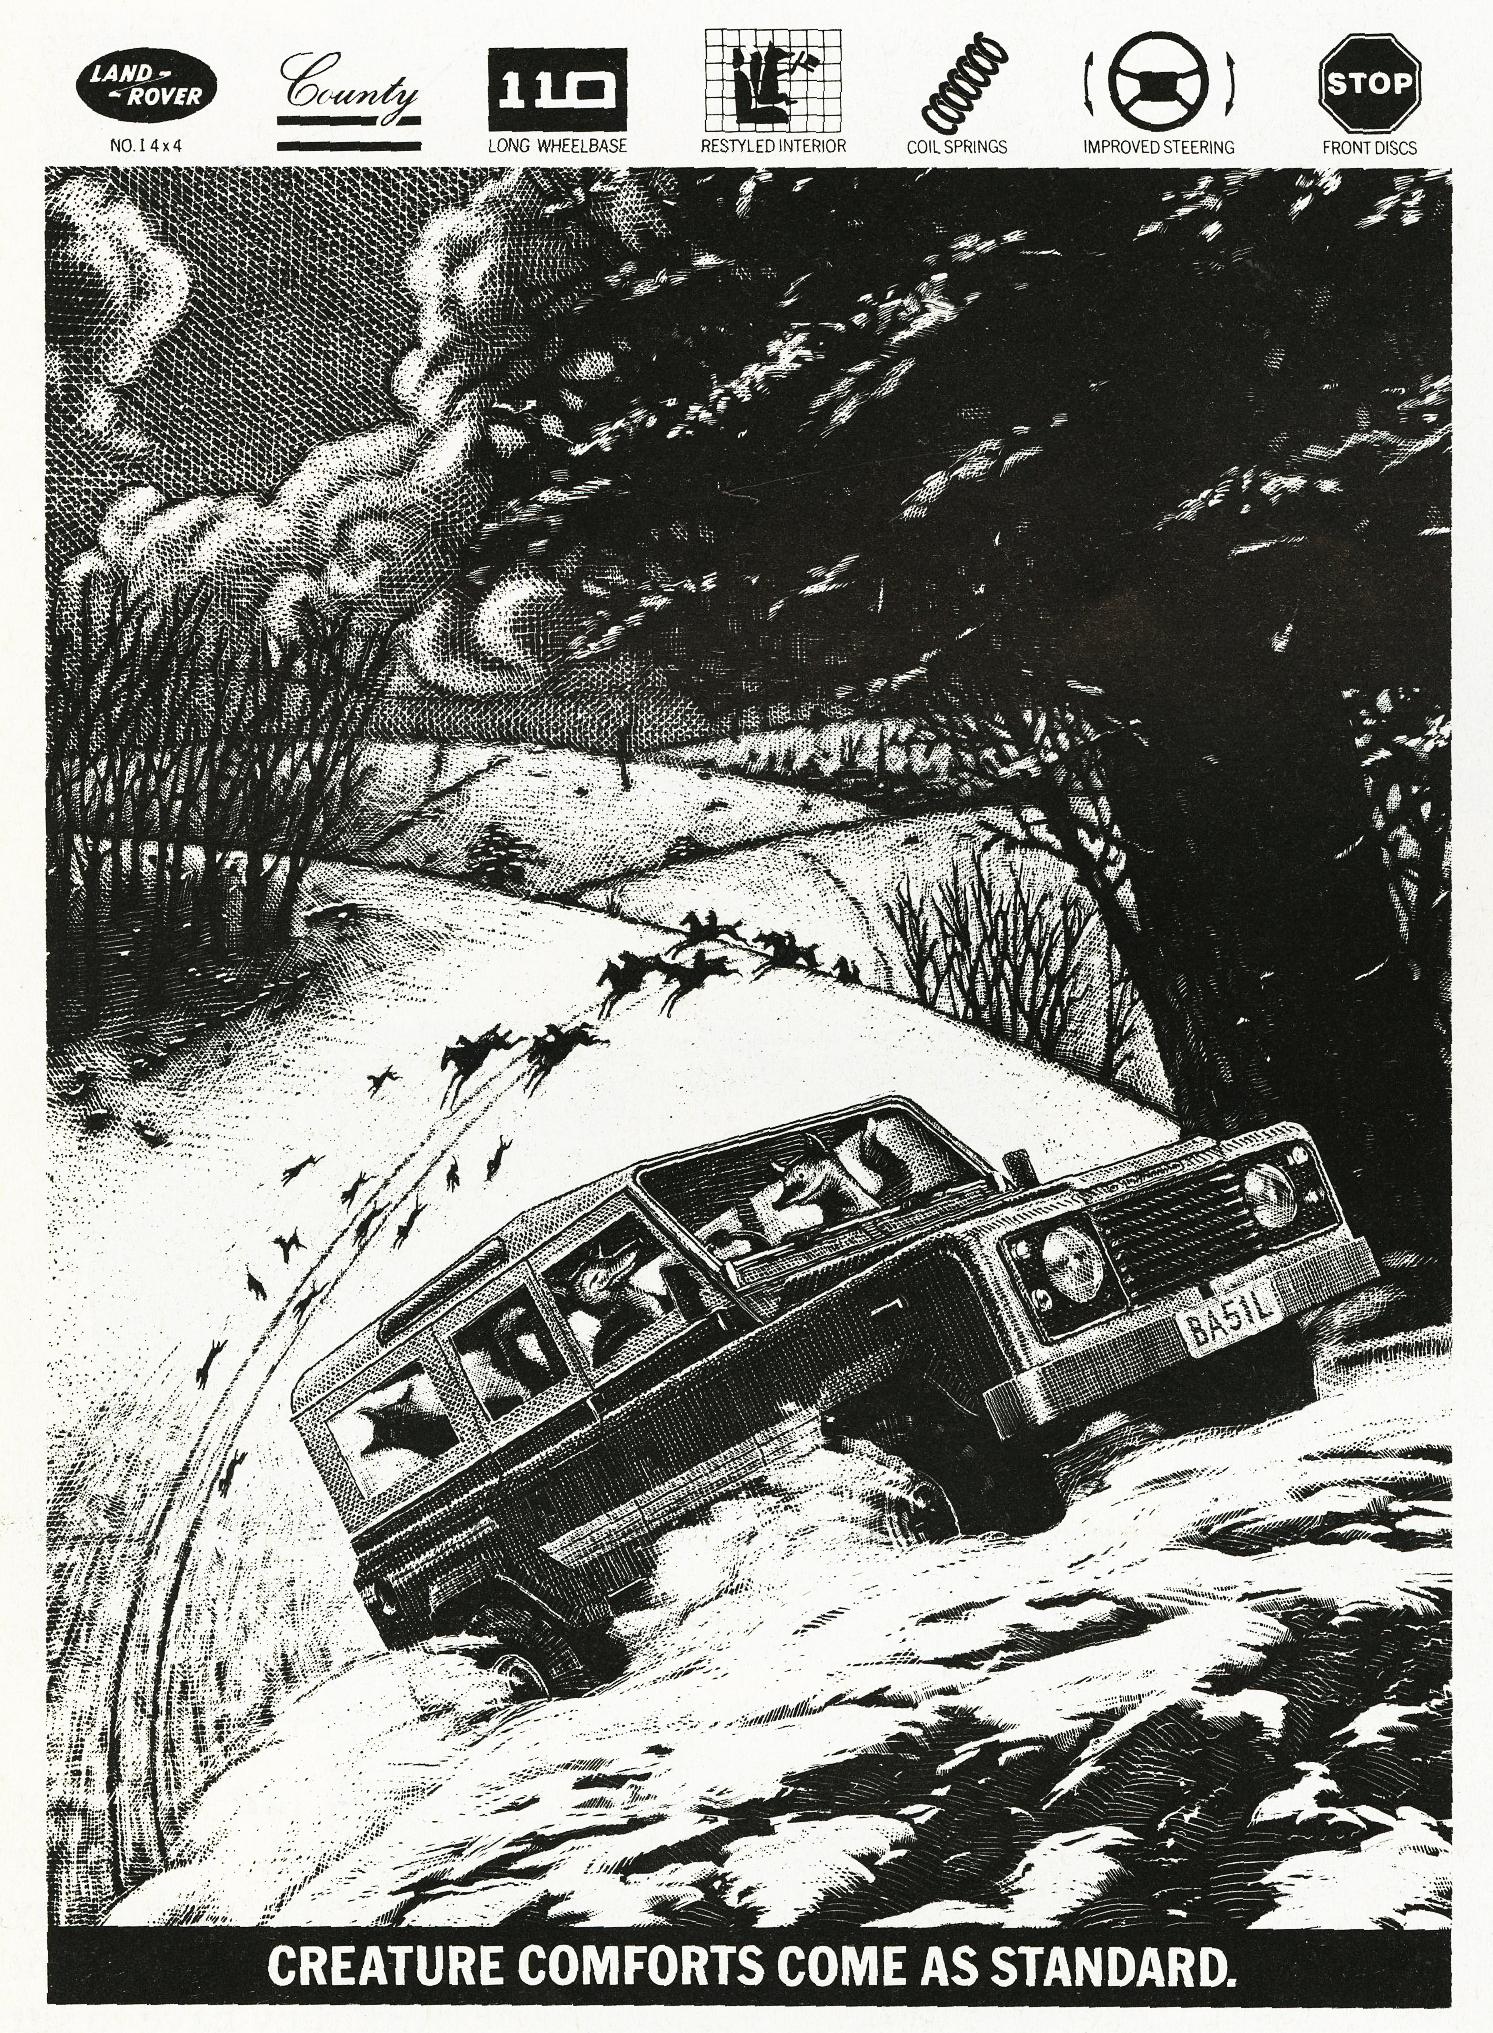 Land Rover 'Creature', TBWA-01